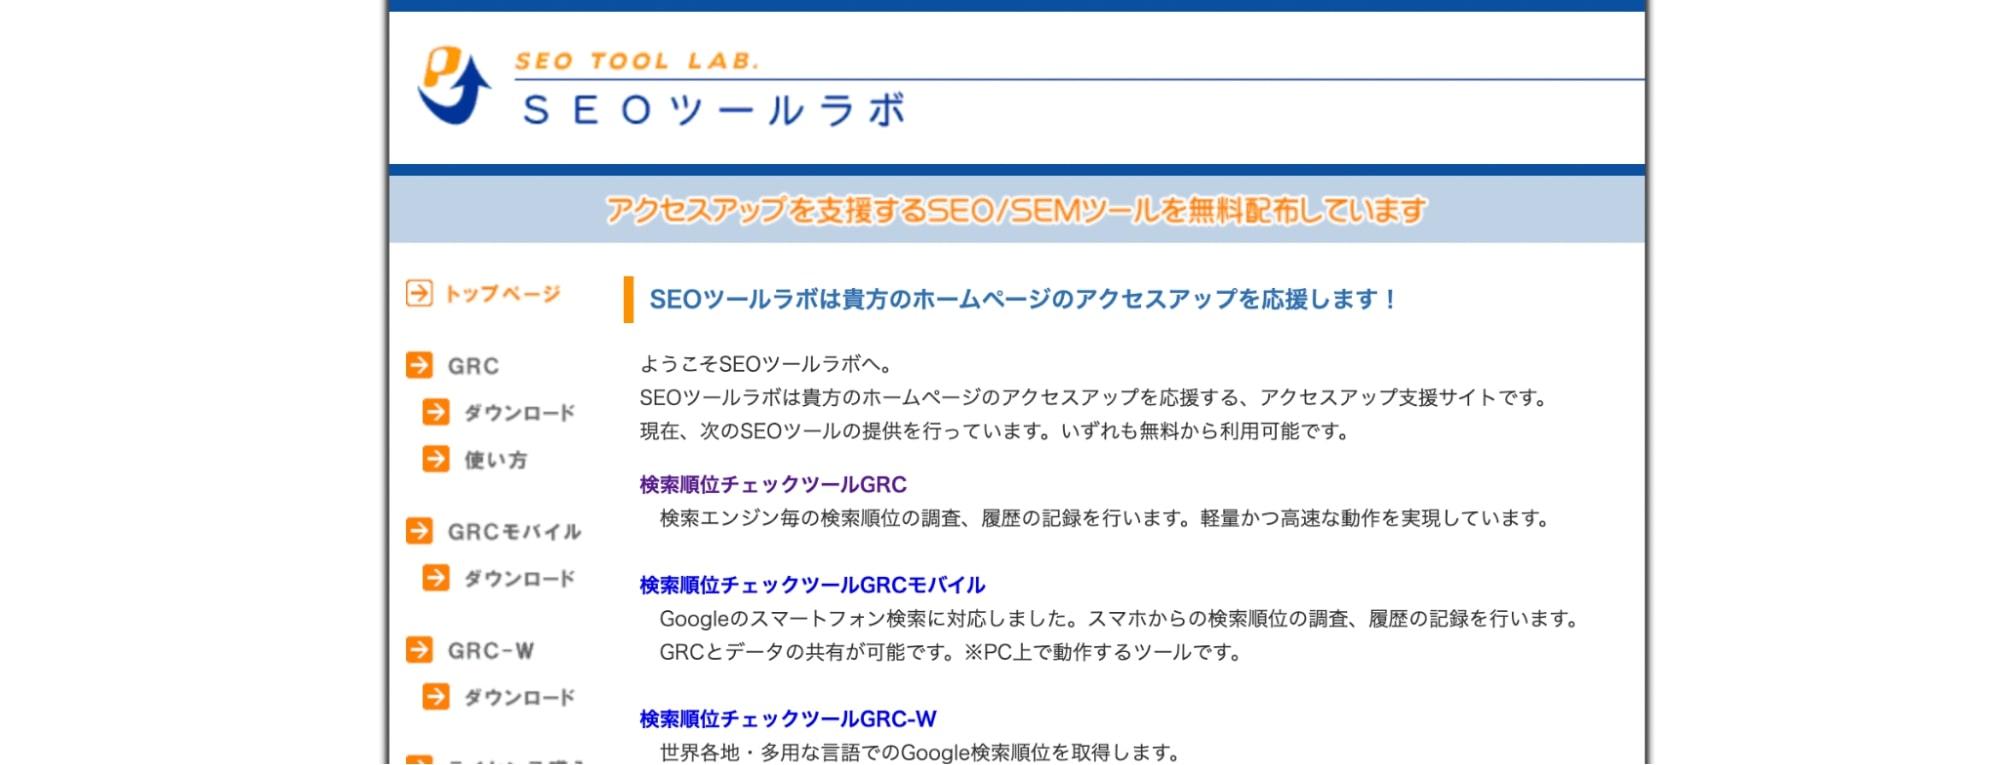 image13.jpg